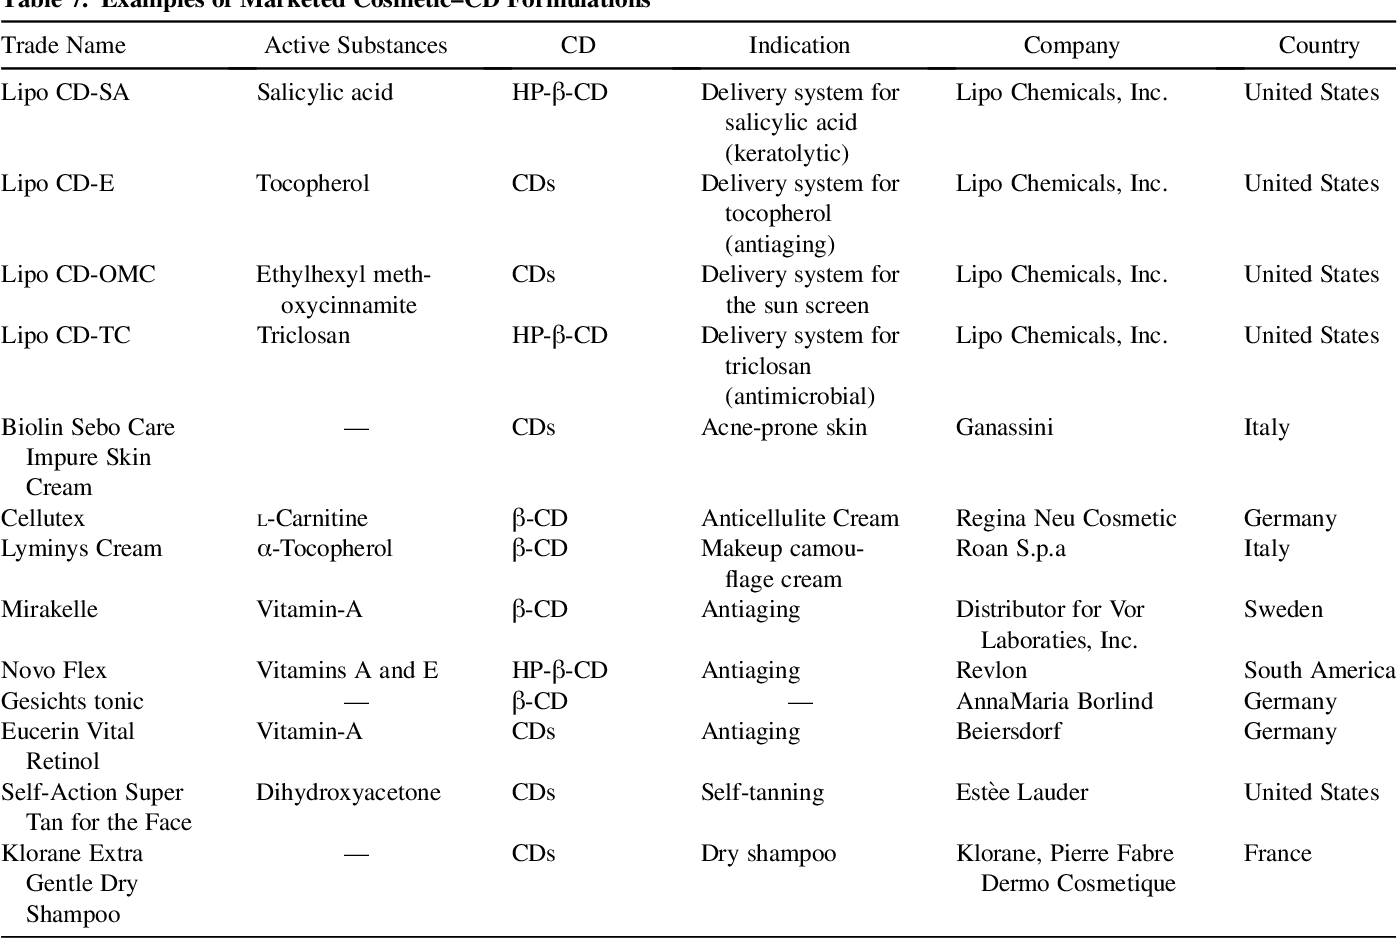 Cyclodextrins in Pharmaceutics, Cosmetics, and Biomedicine